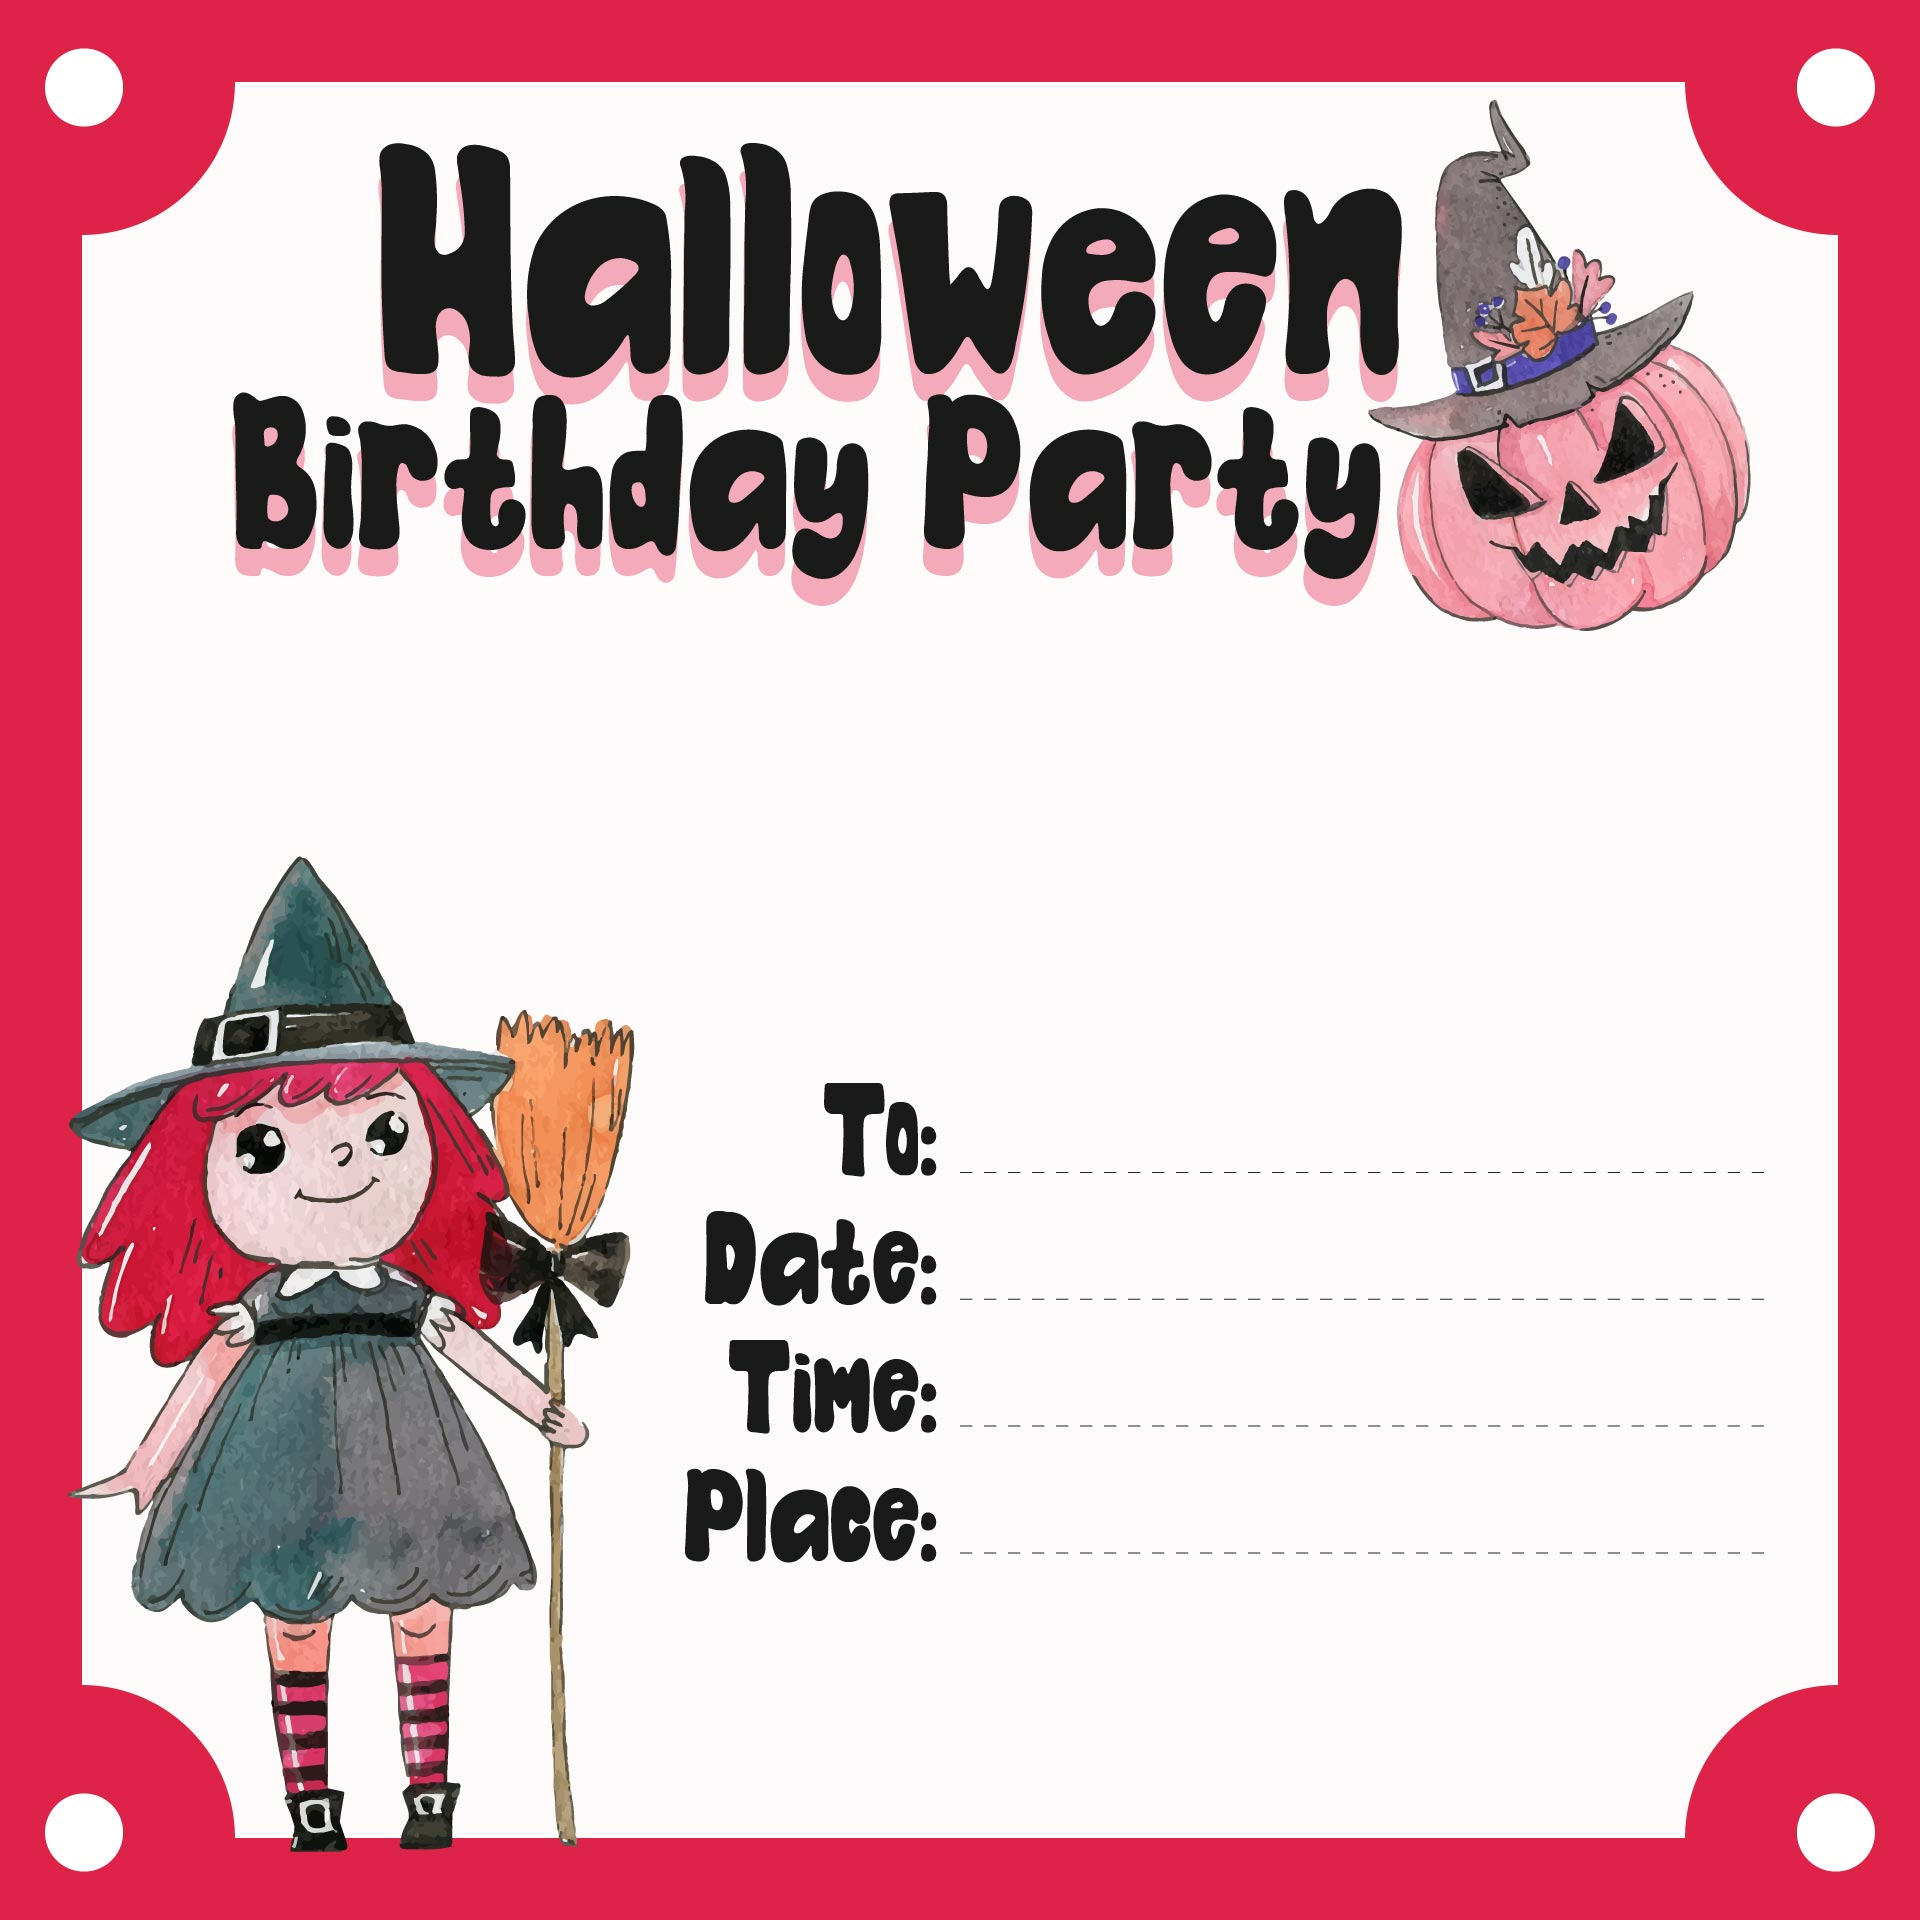 Halloween Party Printable Birthday Invitations